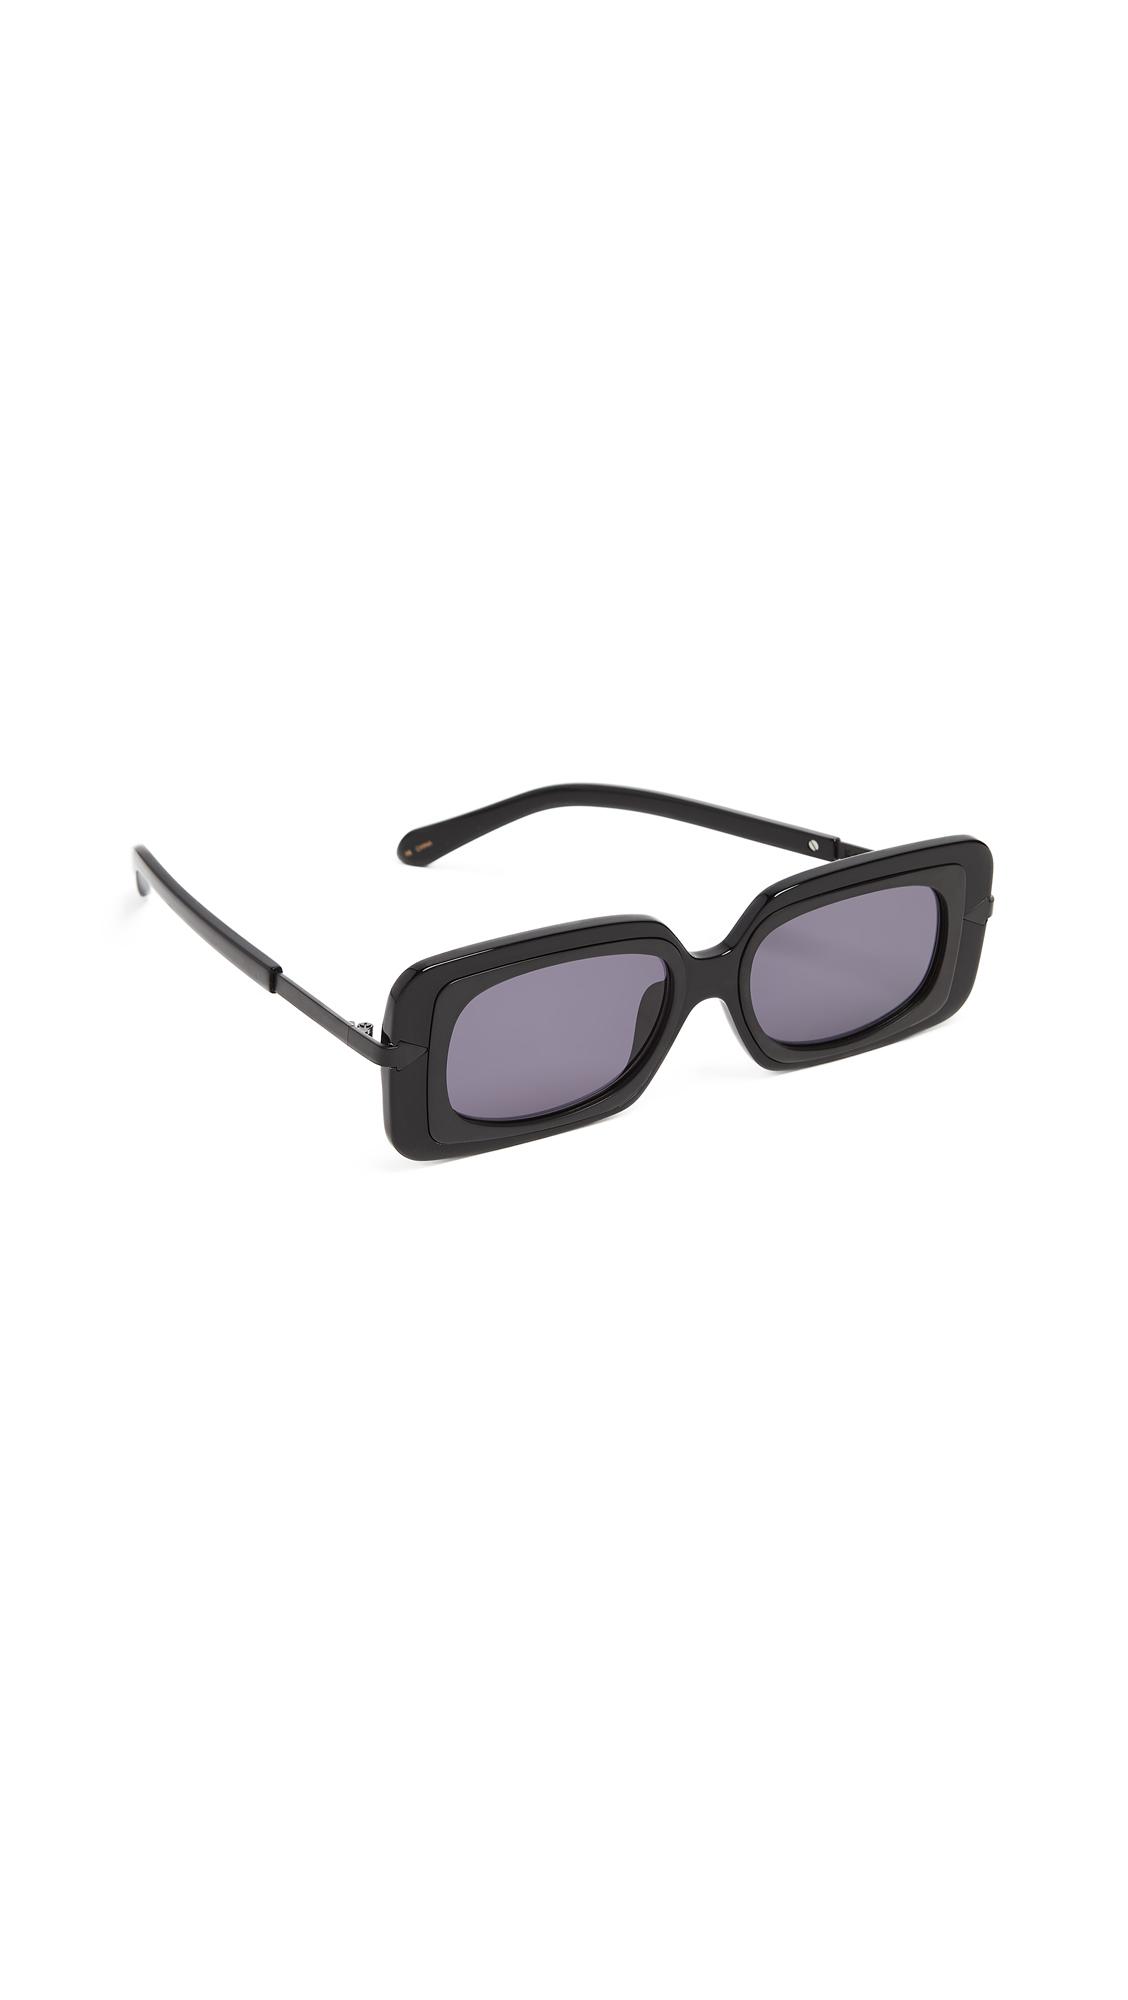 ac6f1cf38f7 Karen Walker Mr Binnacle Sunglasses In Black Smoke Mono ...